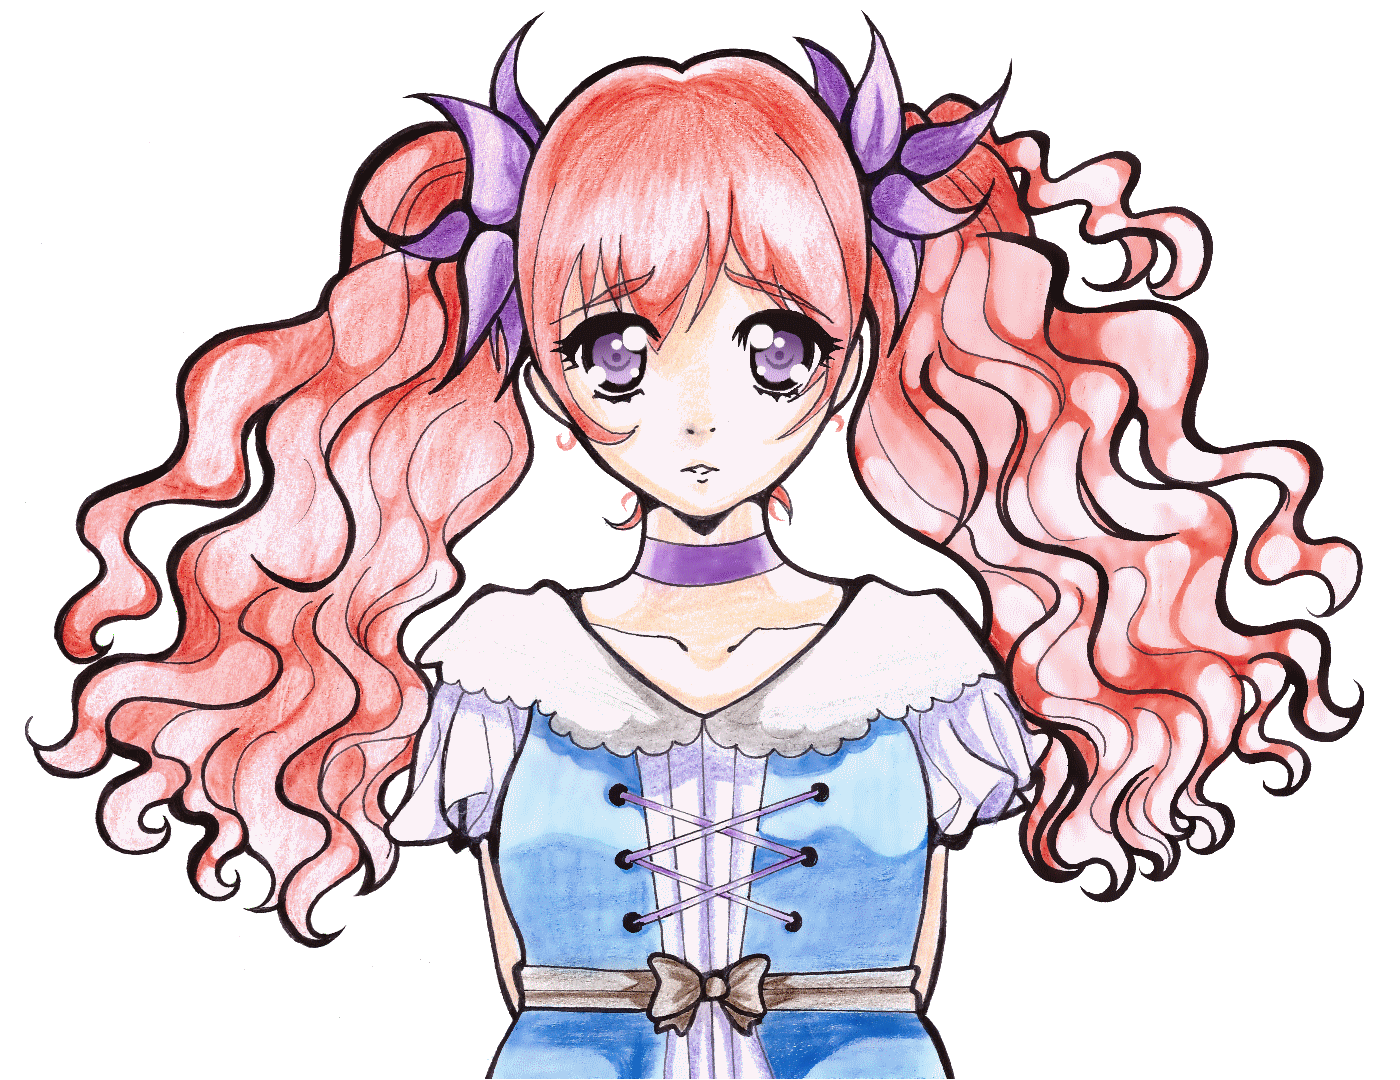 Princessemagic_Karakuri_Pierrot-1424440445.png